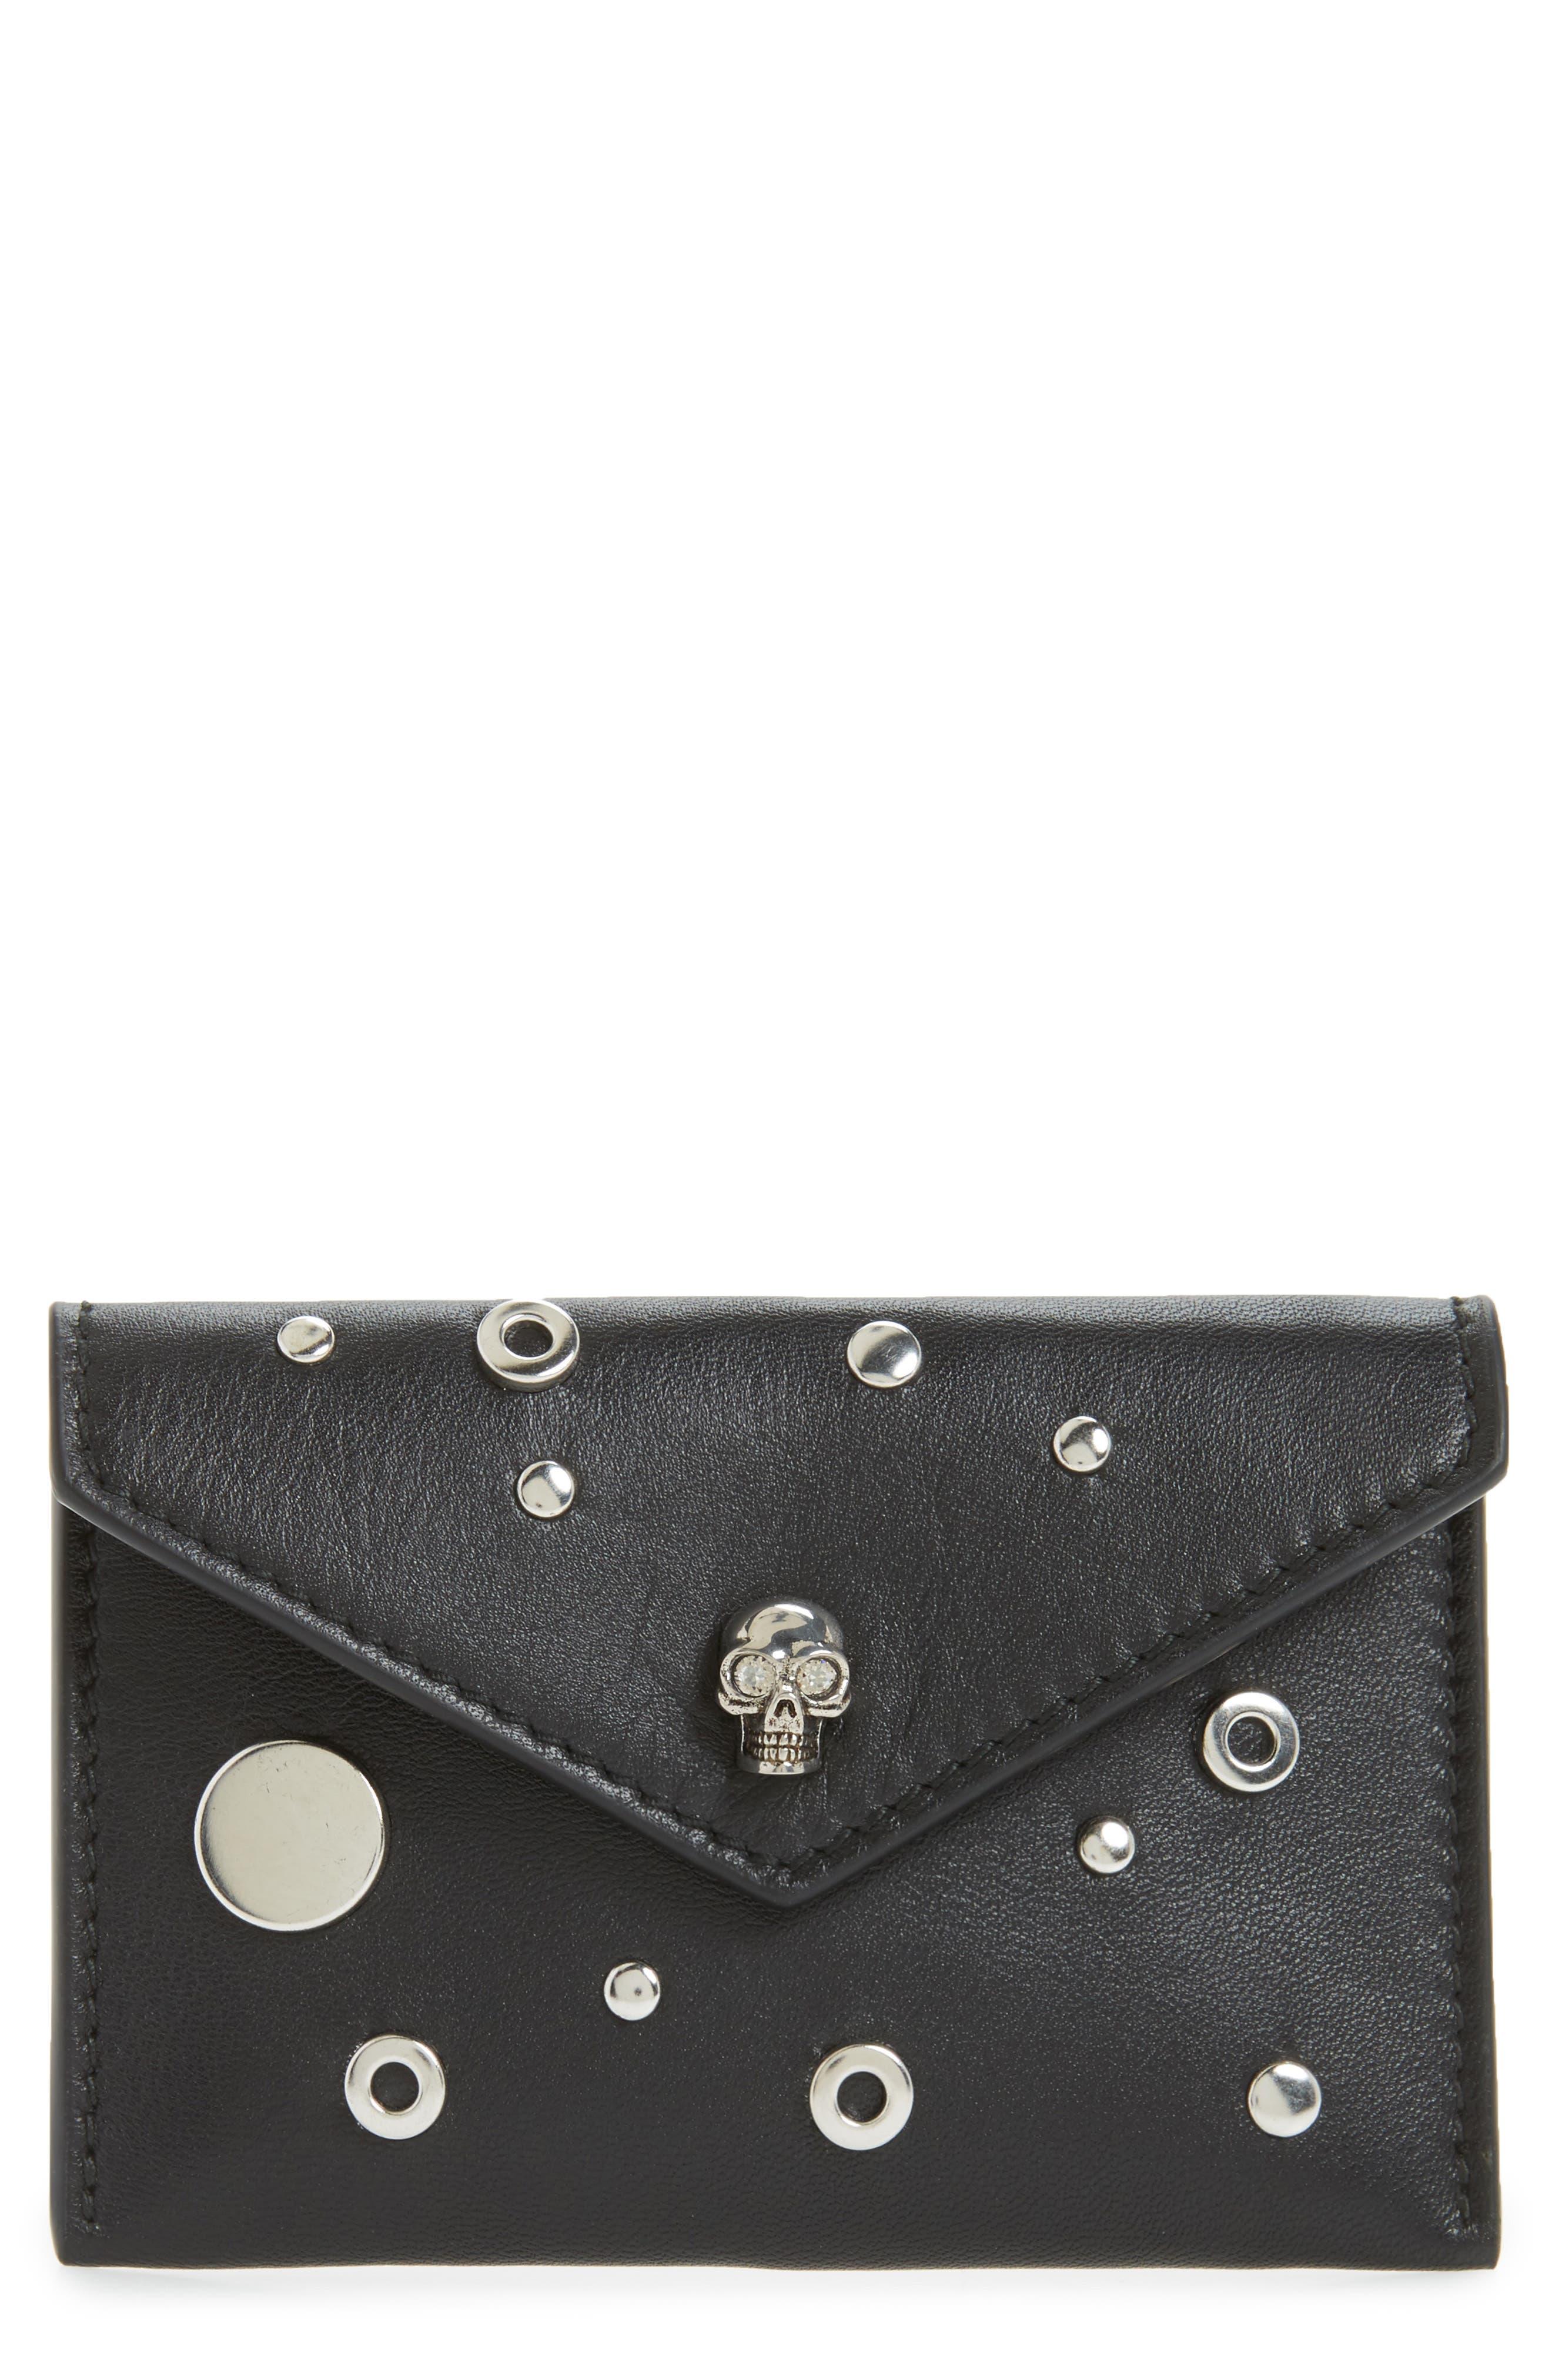 Main Image - Alexander McQueen Calfskin Leather Envelope Card Holder